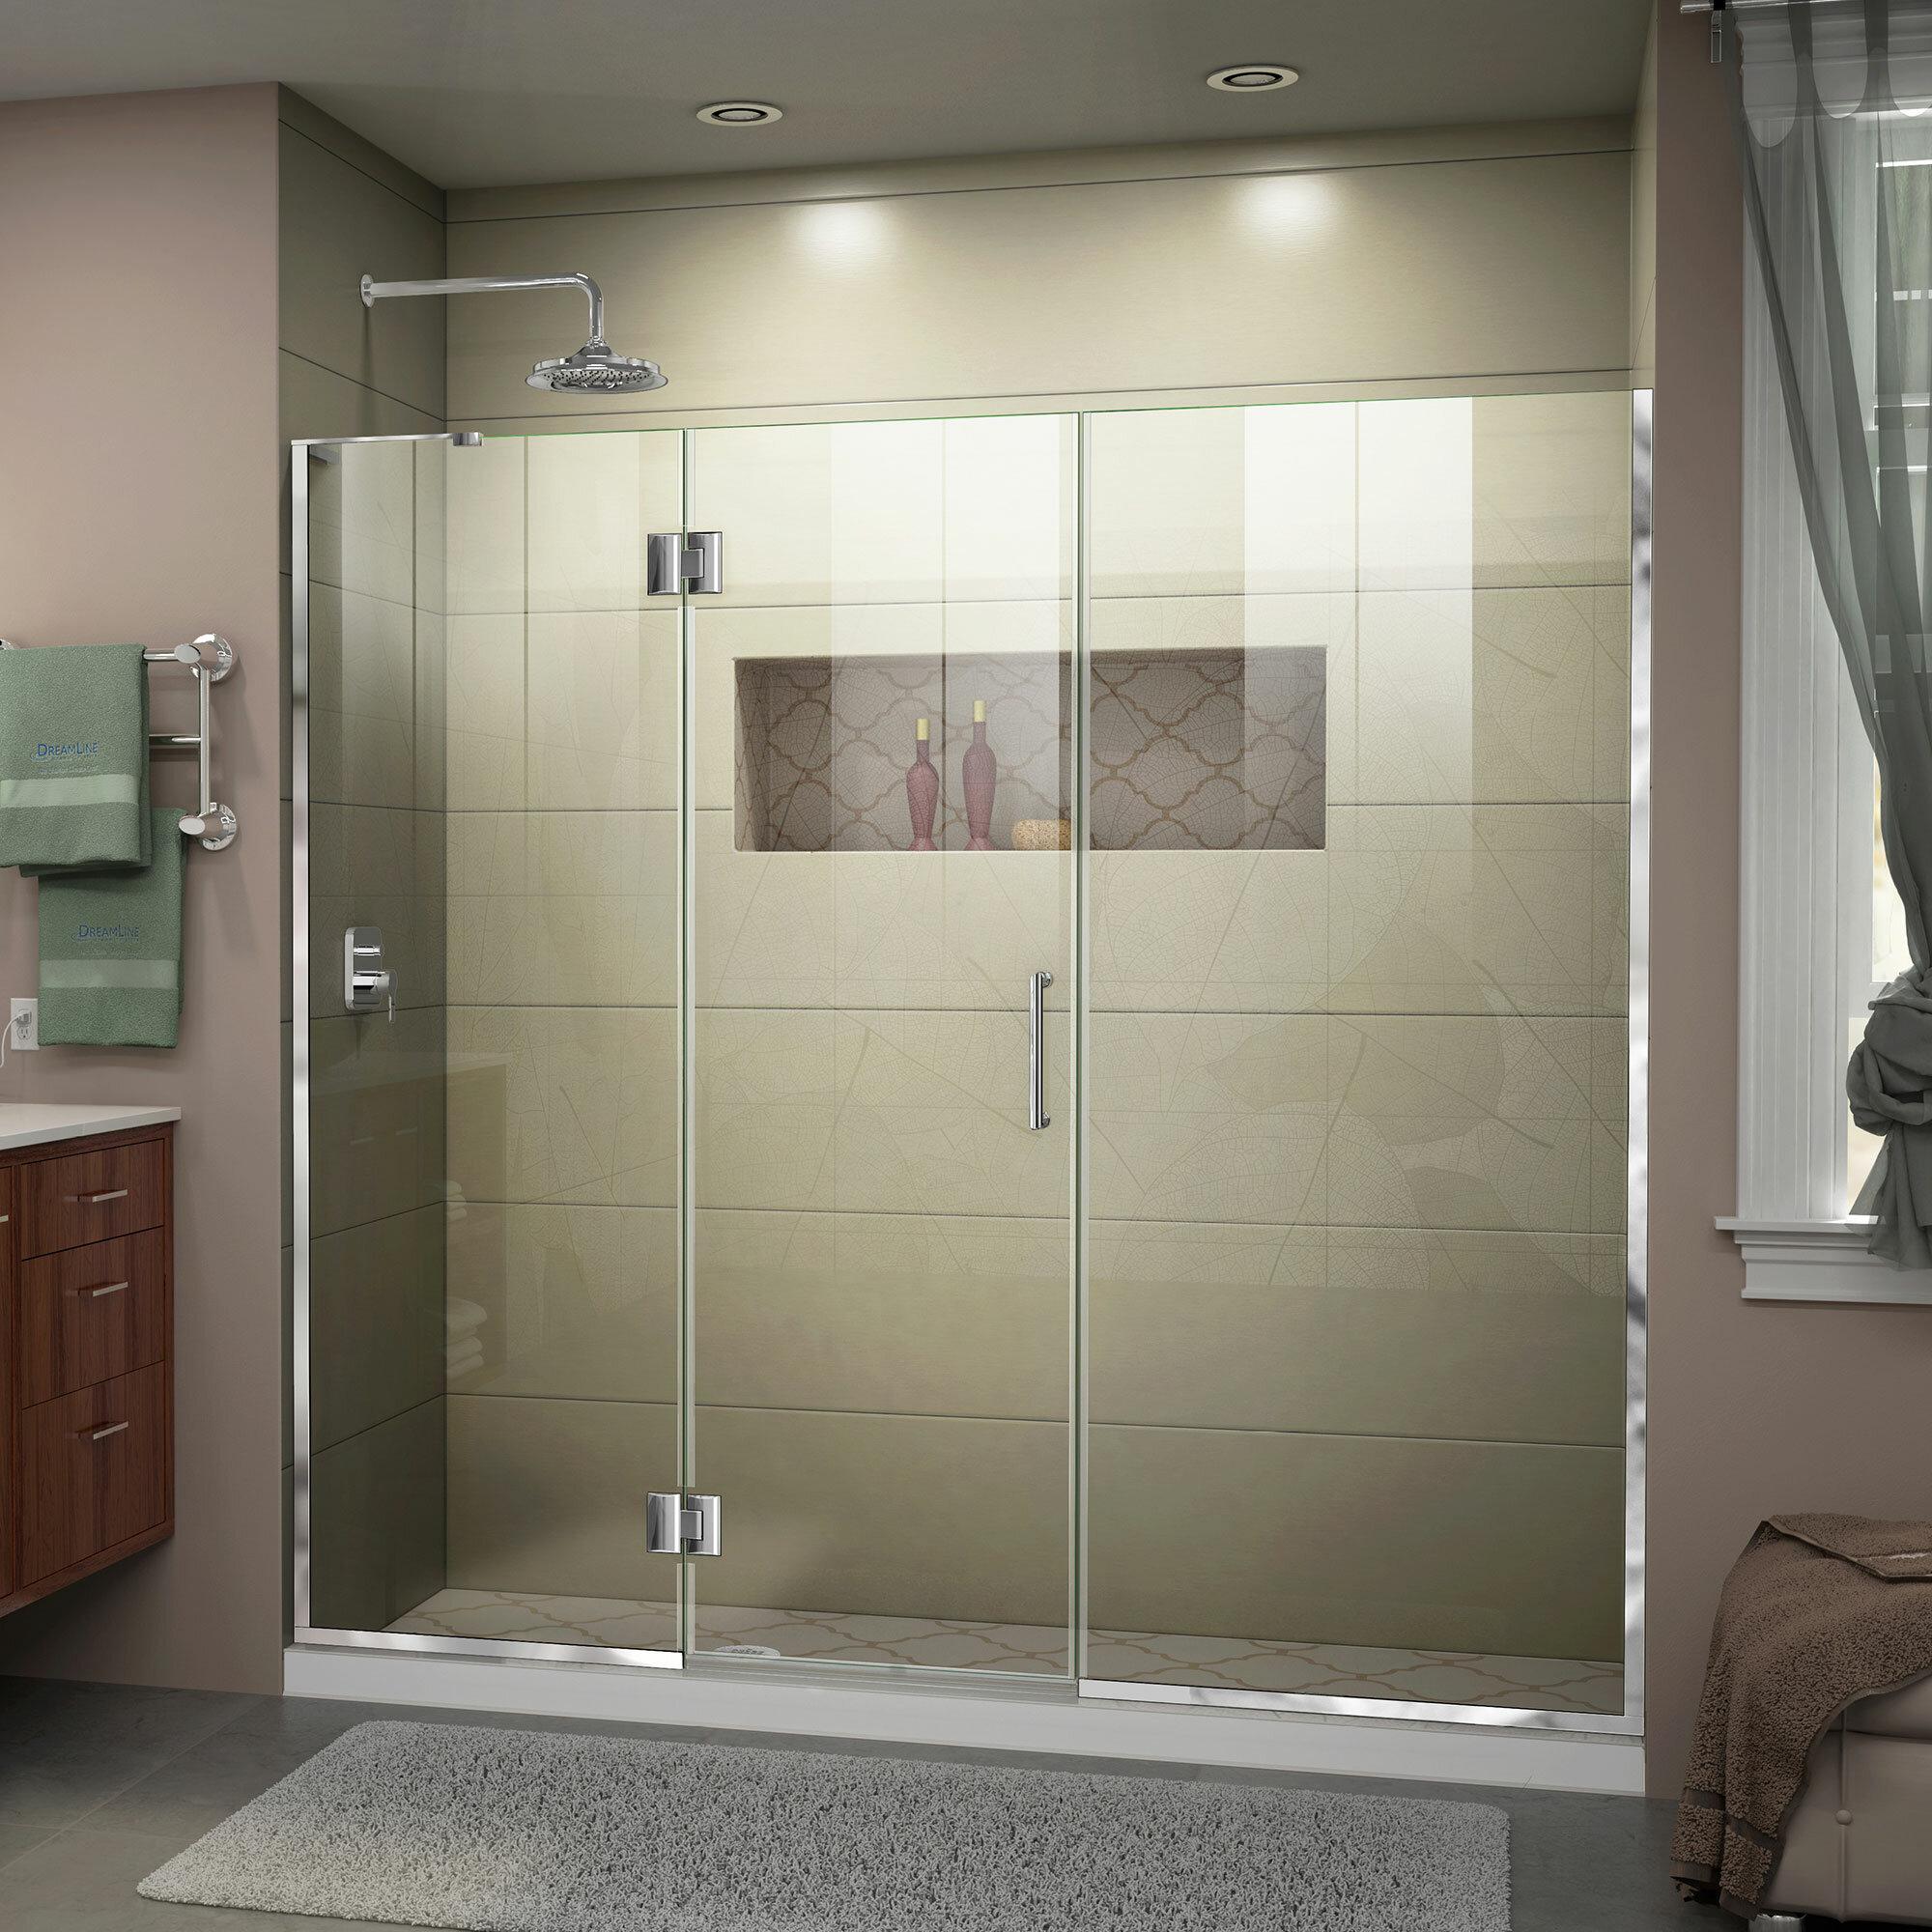 Unidoor X 66 X 72 Hinged Frameless Shower Door With Clearmax Technology